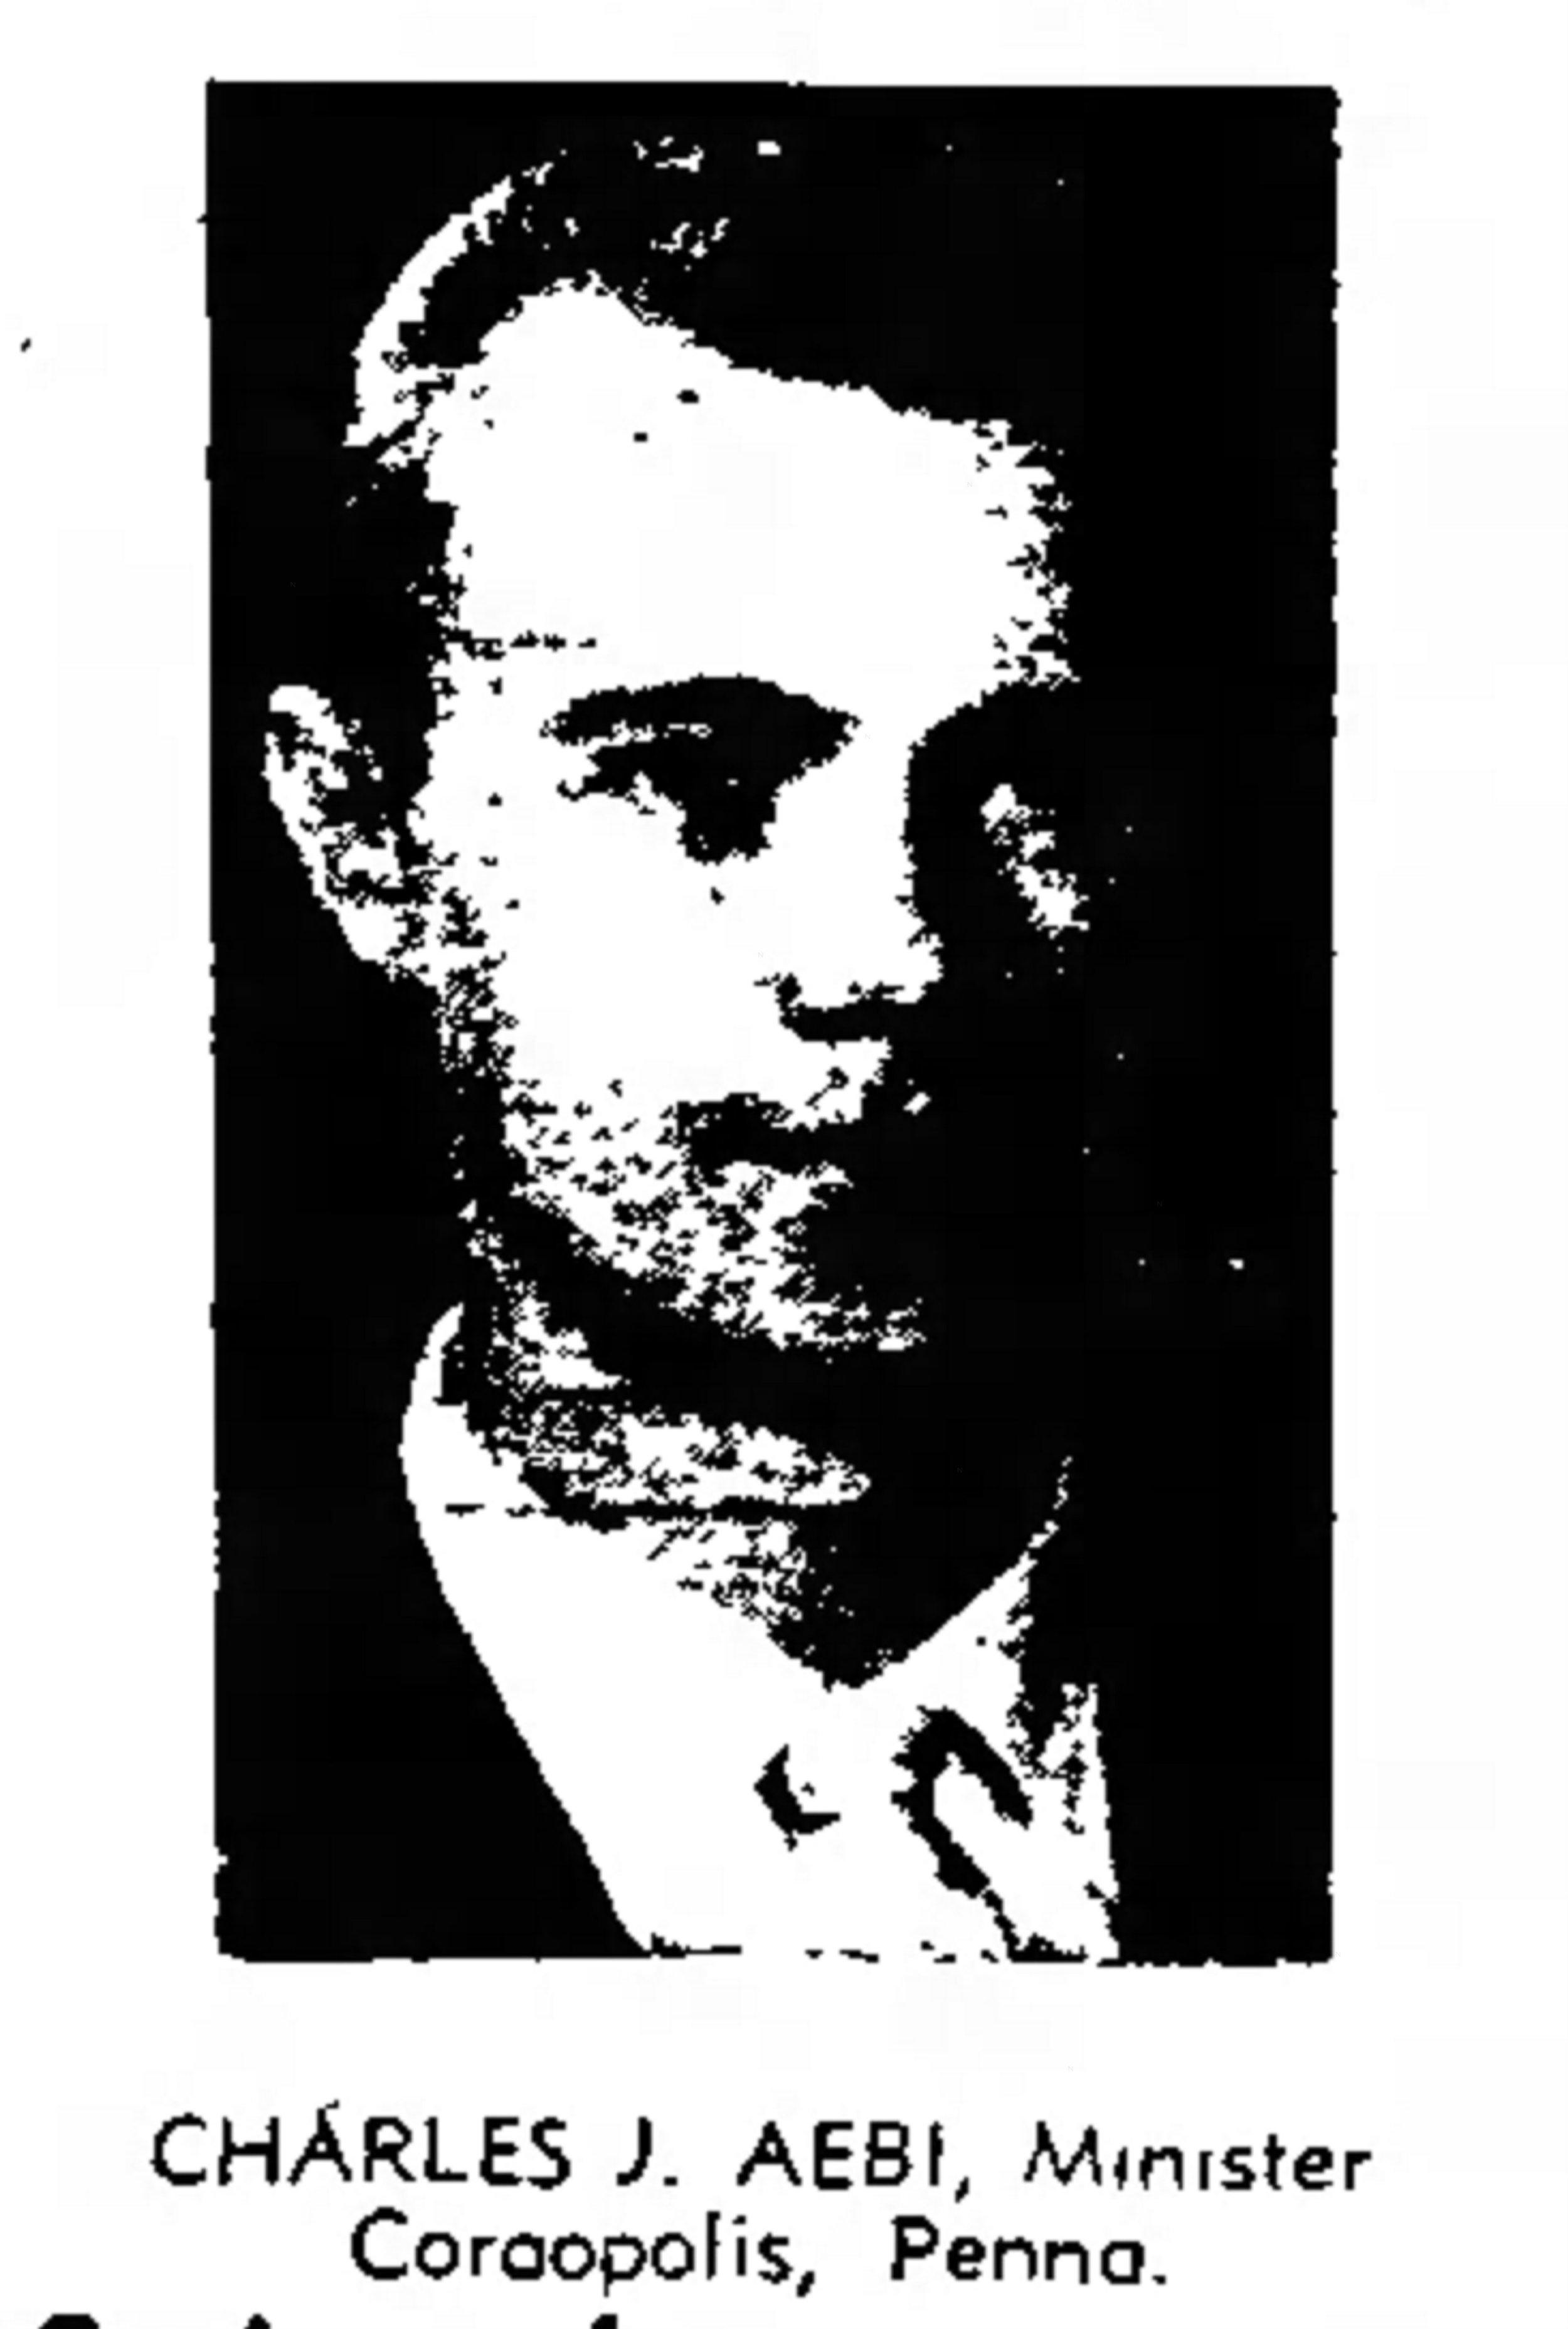 1961-08-17 North Hills News-Record (n47, p8)